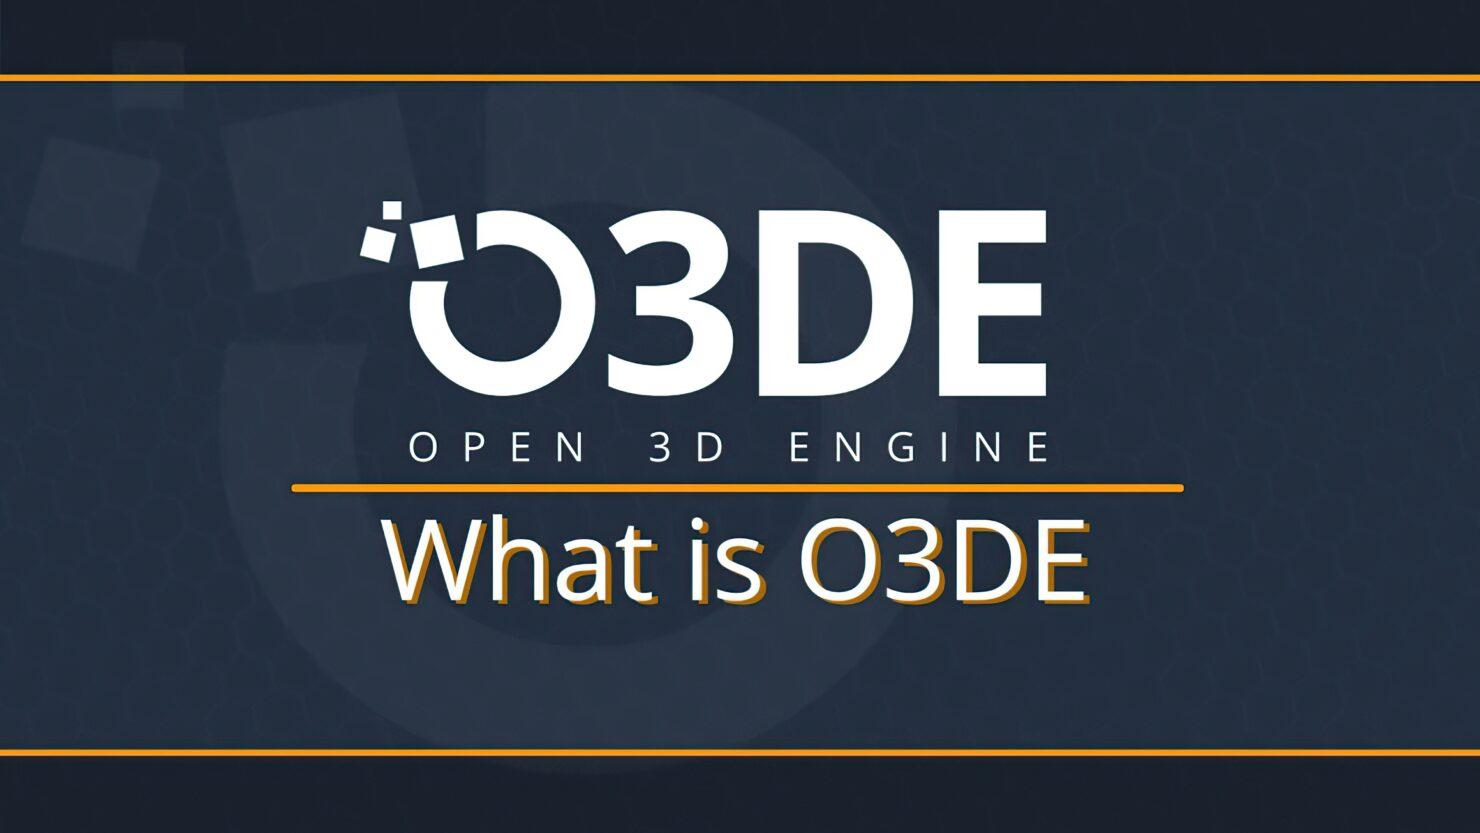 Open 3D Engine